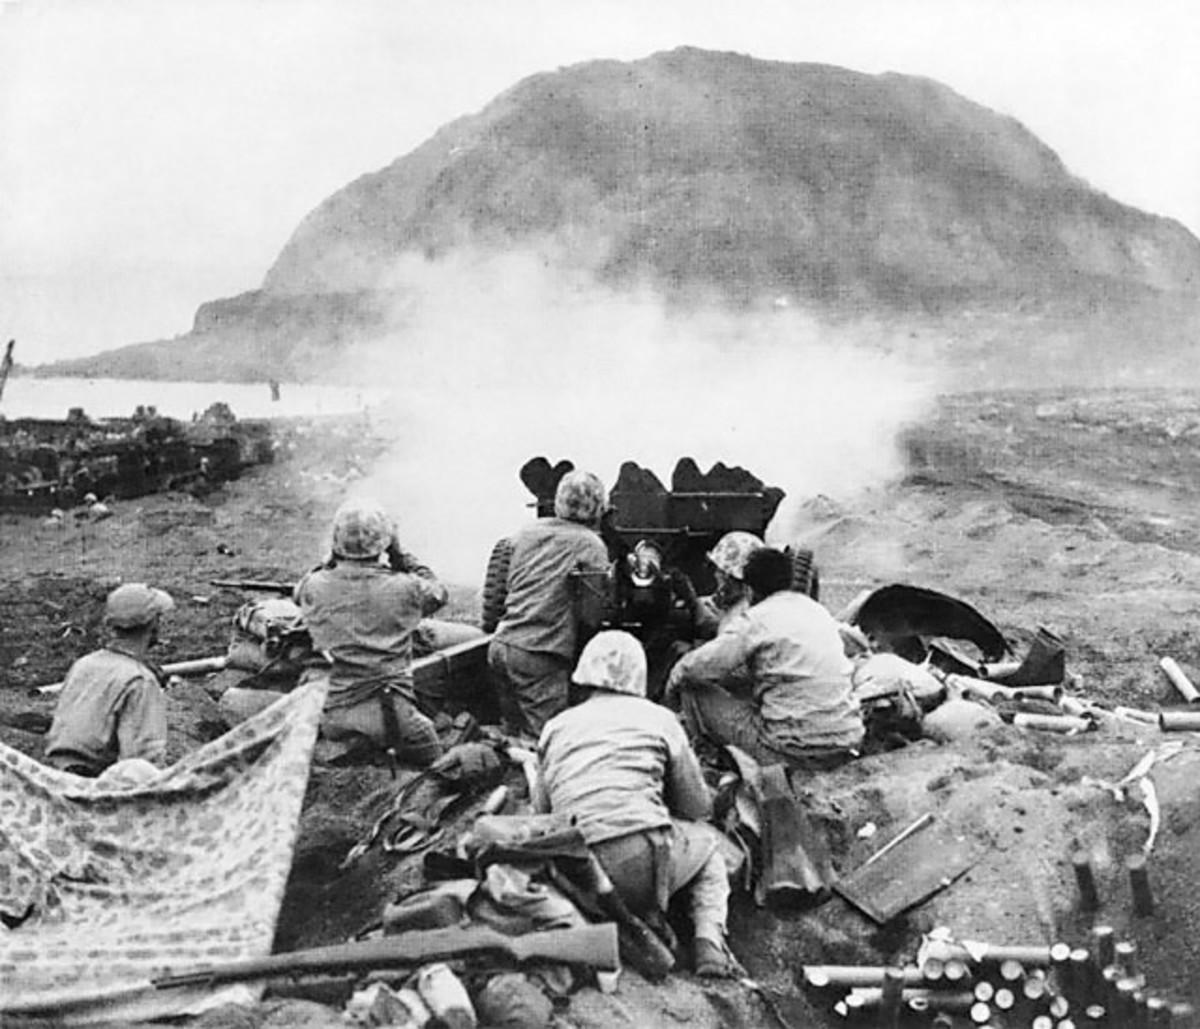 Marines returning fire towards Mount Suribachi.